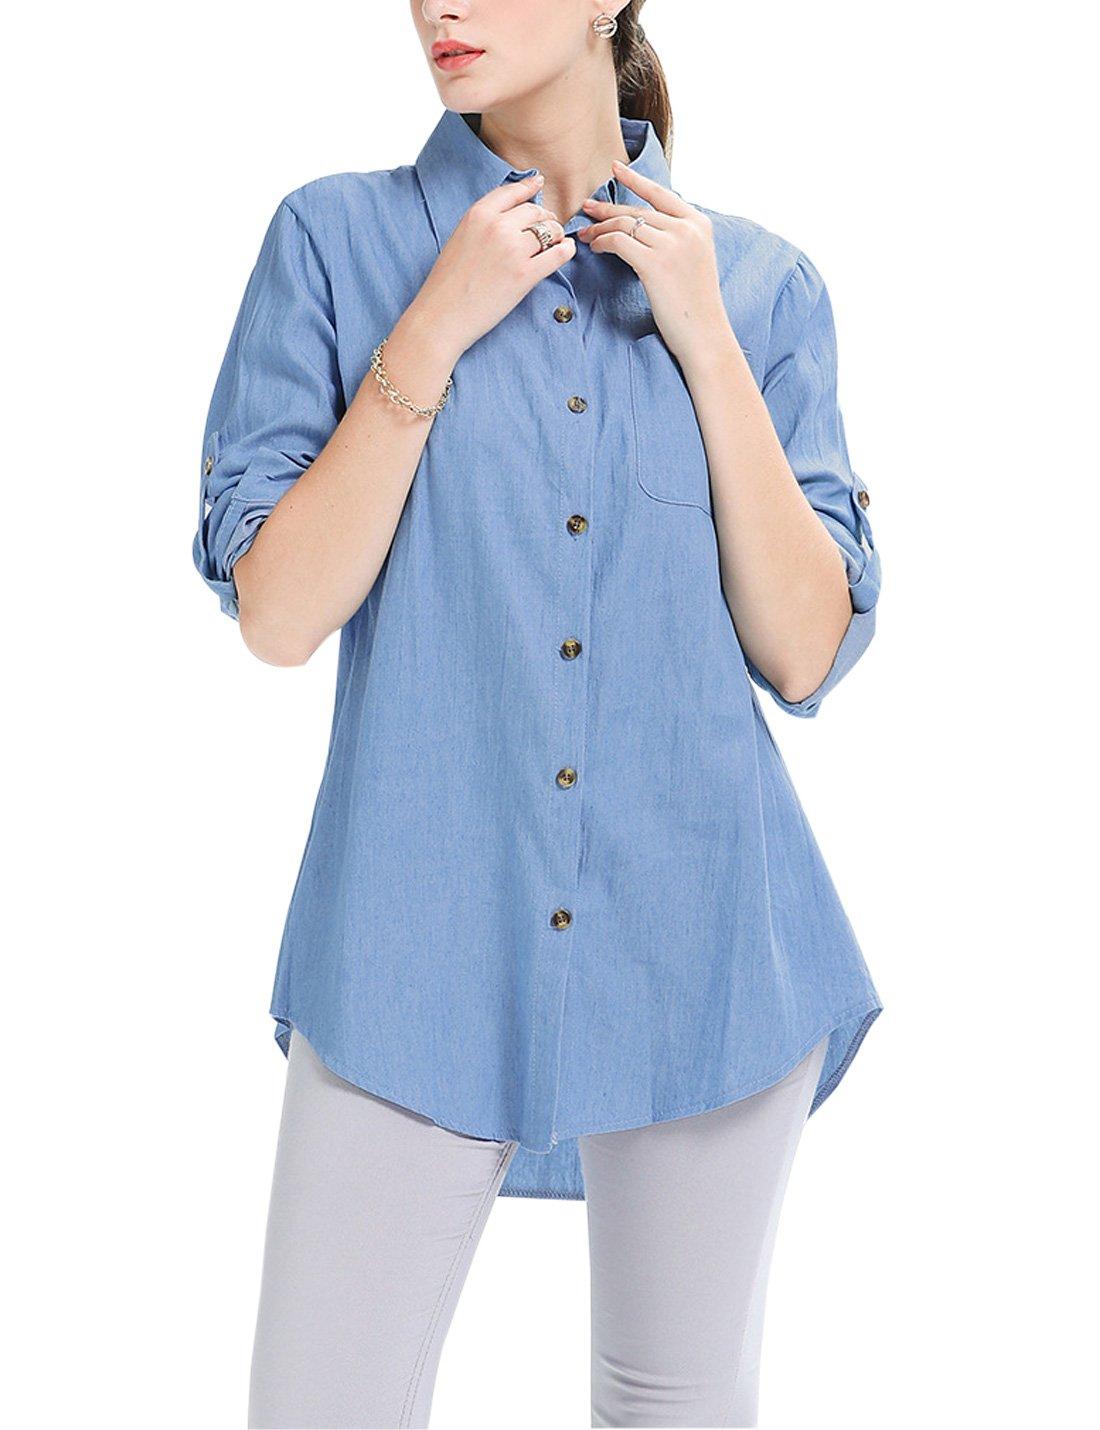 af2f6b62555 Jenkoon Women s Button Down Long Roll up Sleeves Shirts Jean Denim ...